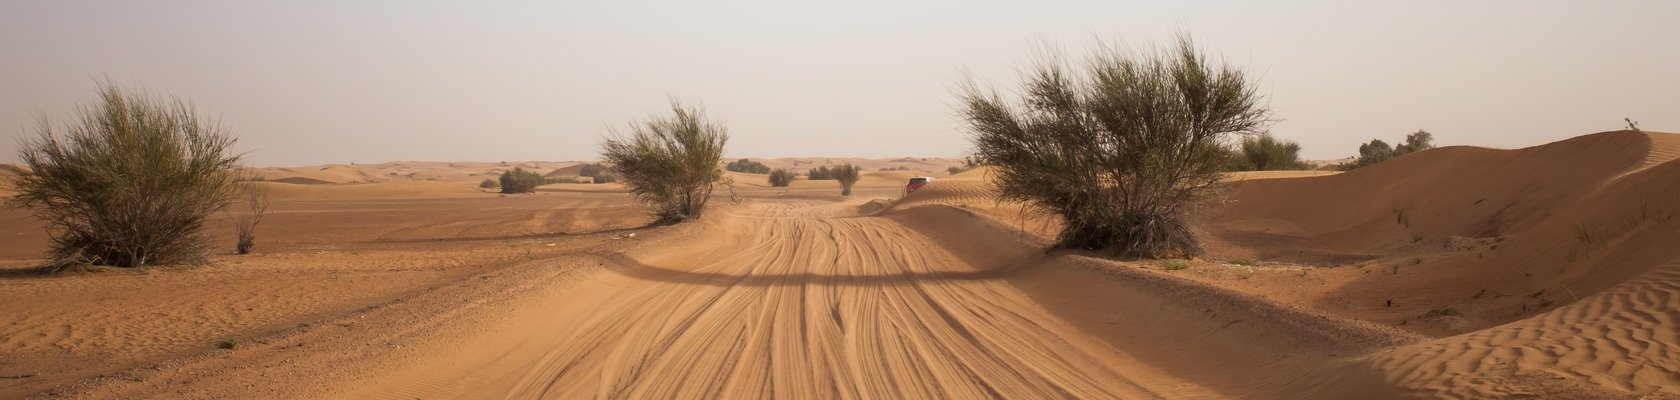 Wahibi Sands, Oman desert